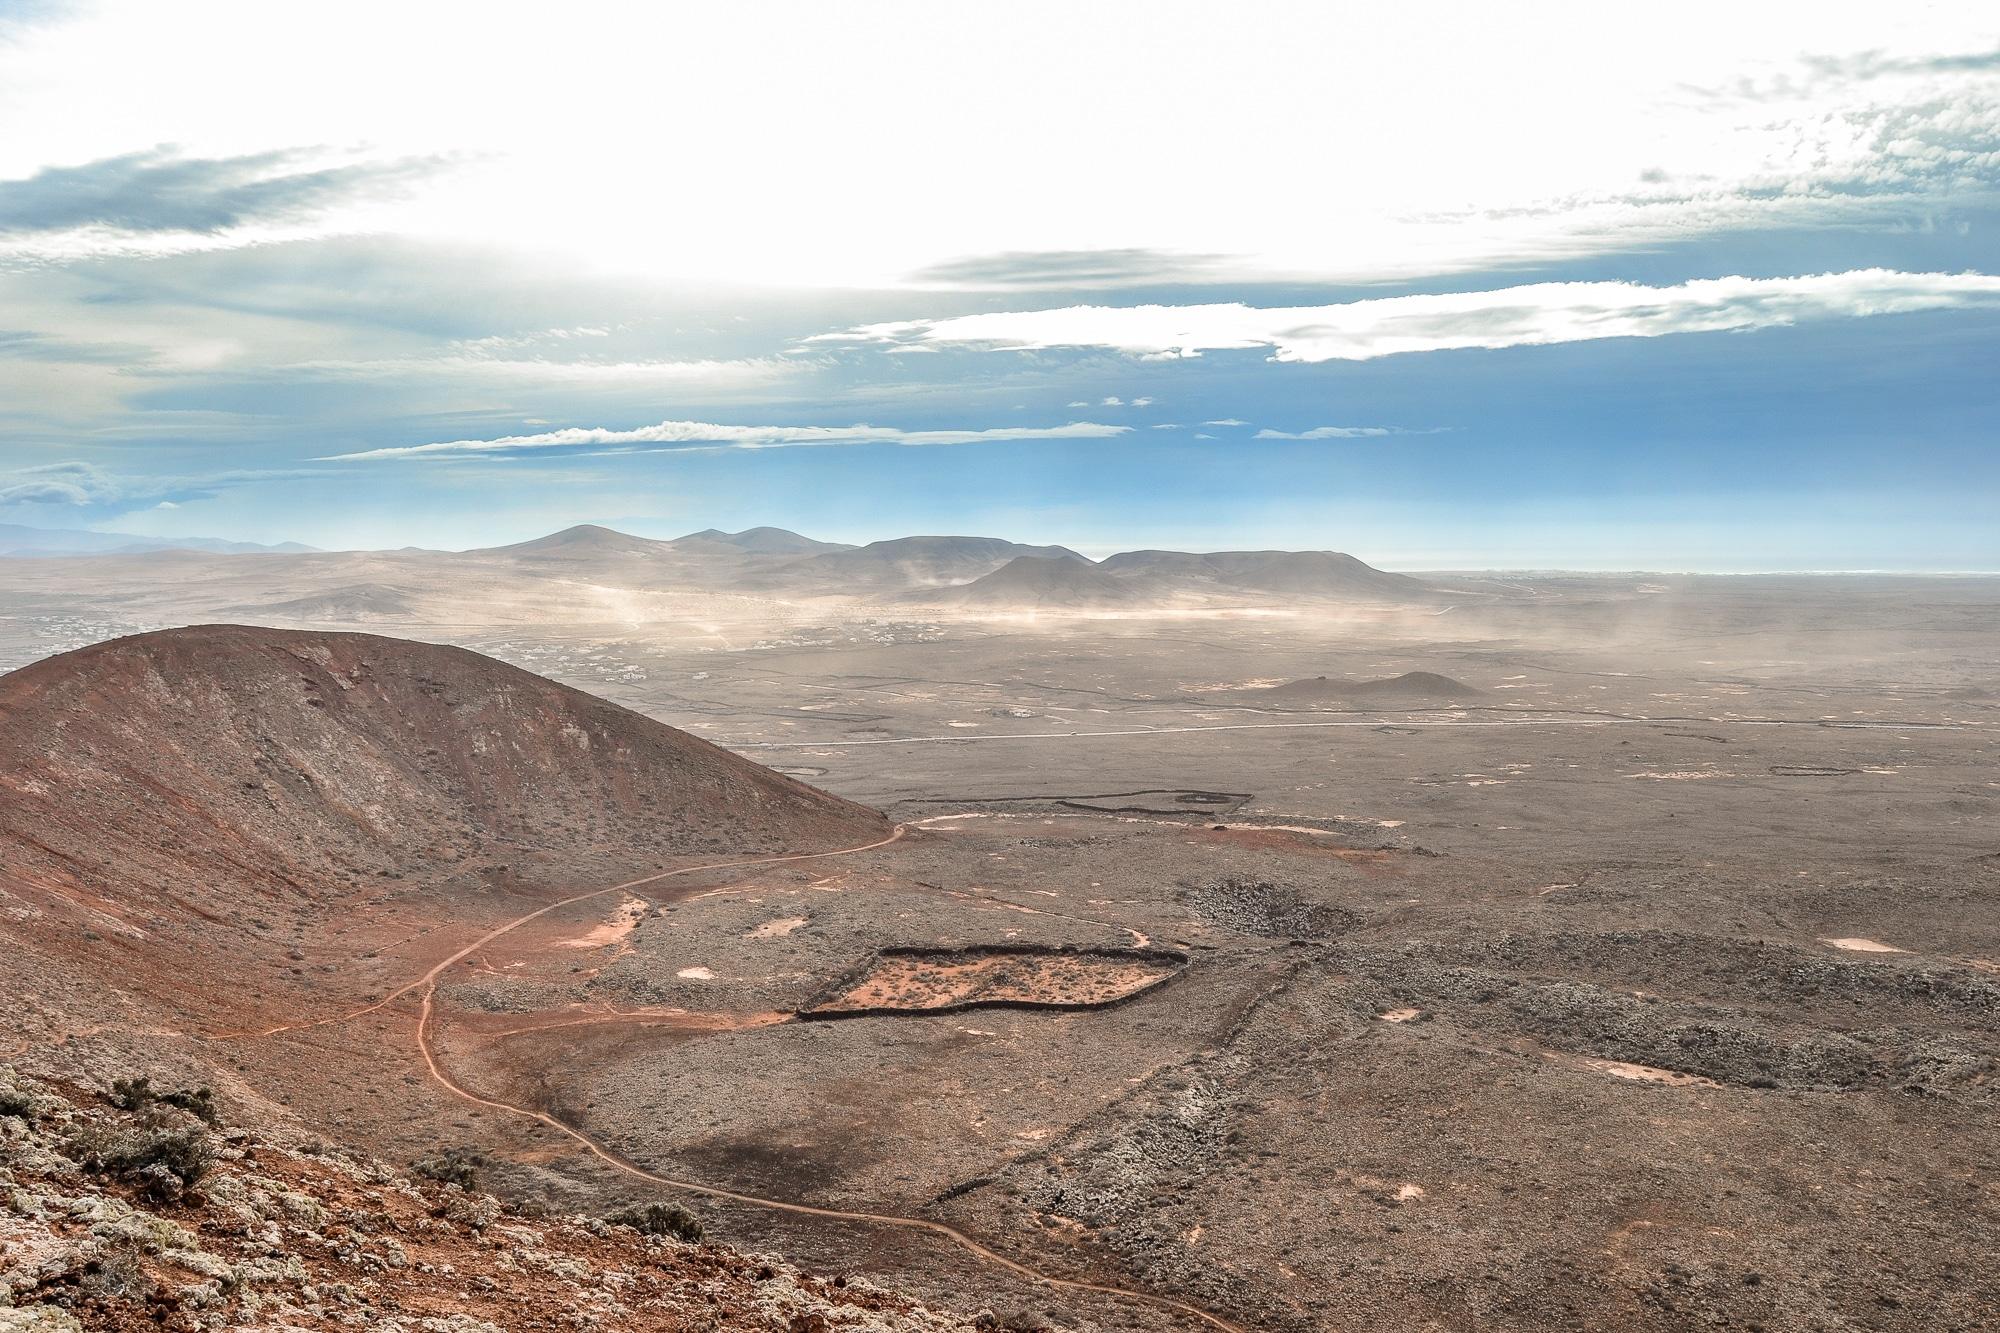 Vulkanwanderung beim Yoga Retreat auf Fuerteventura